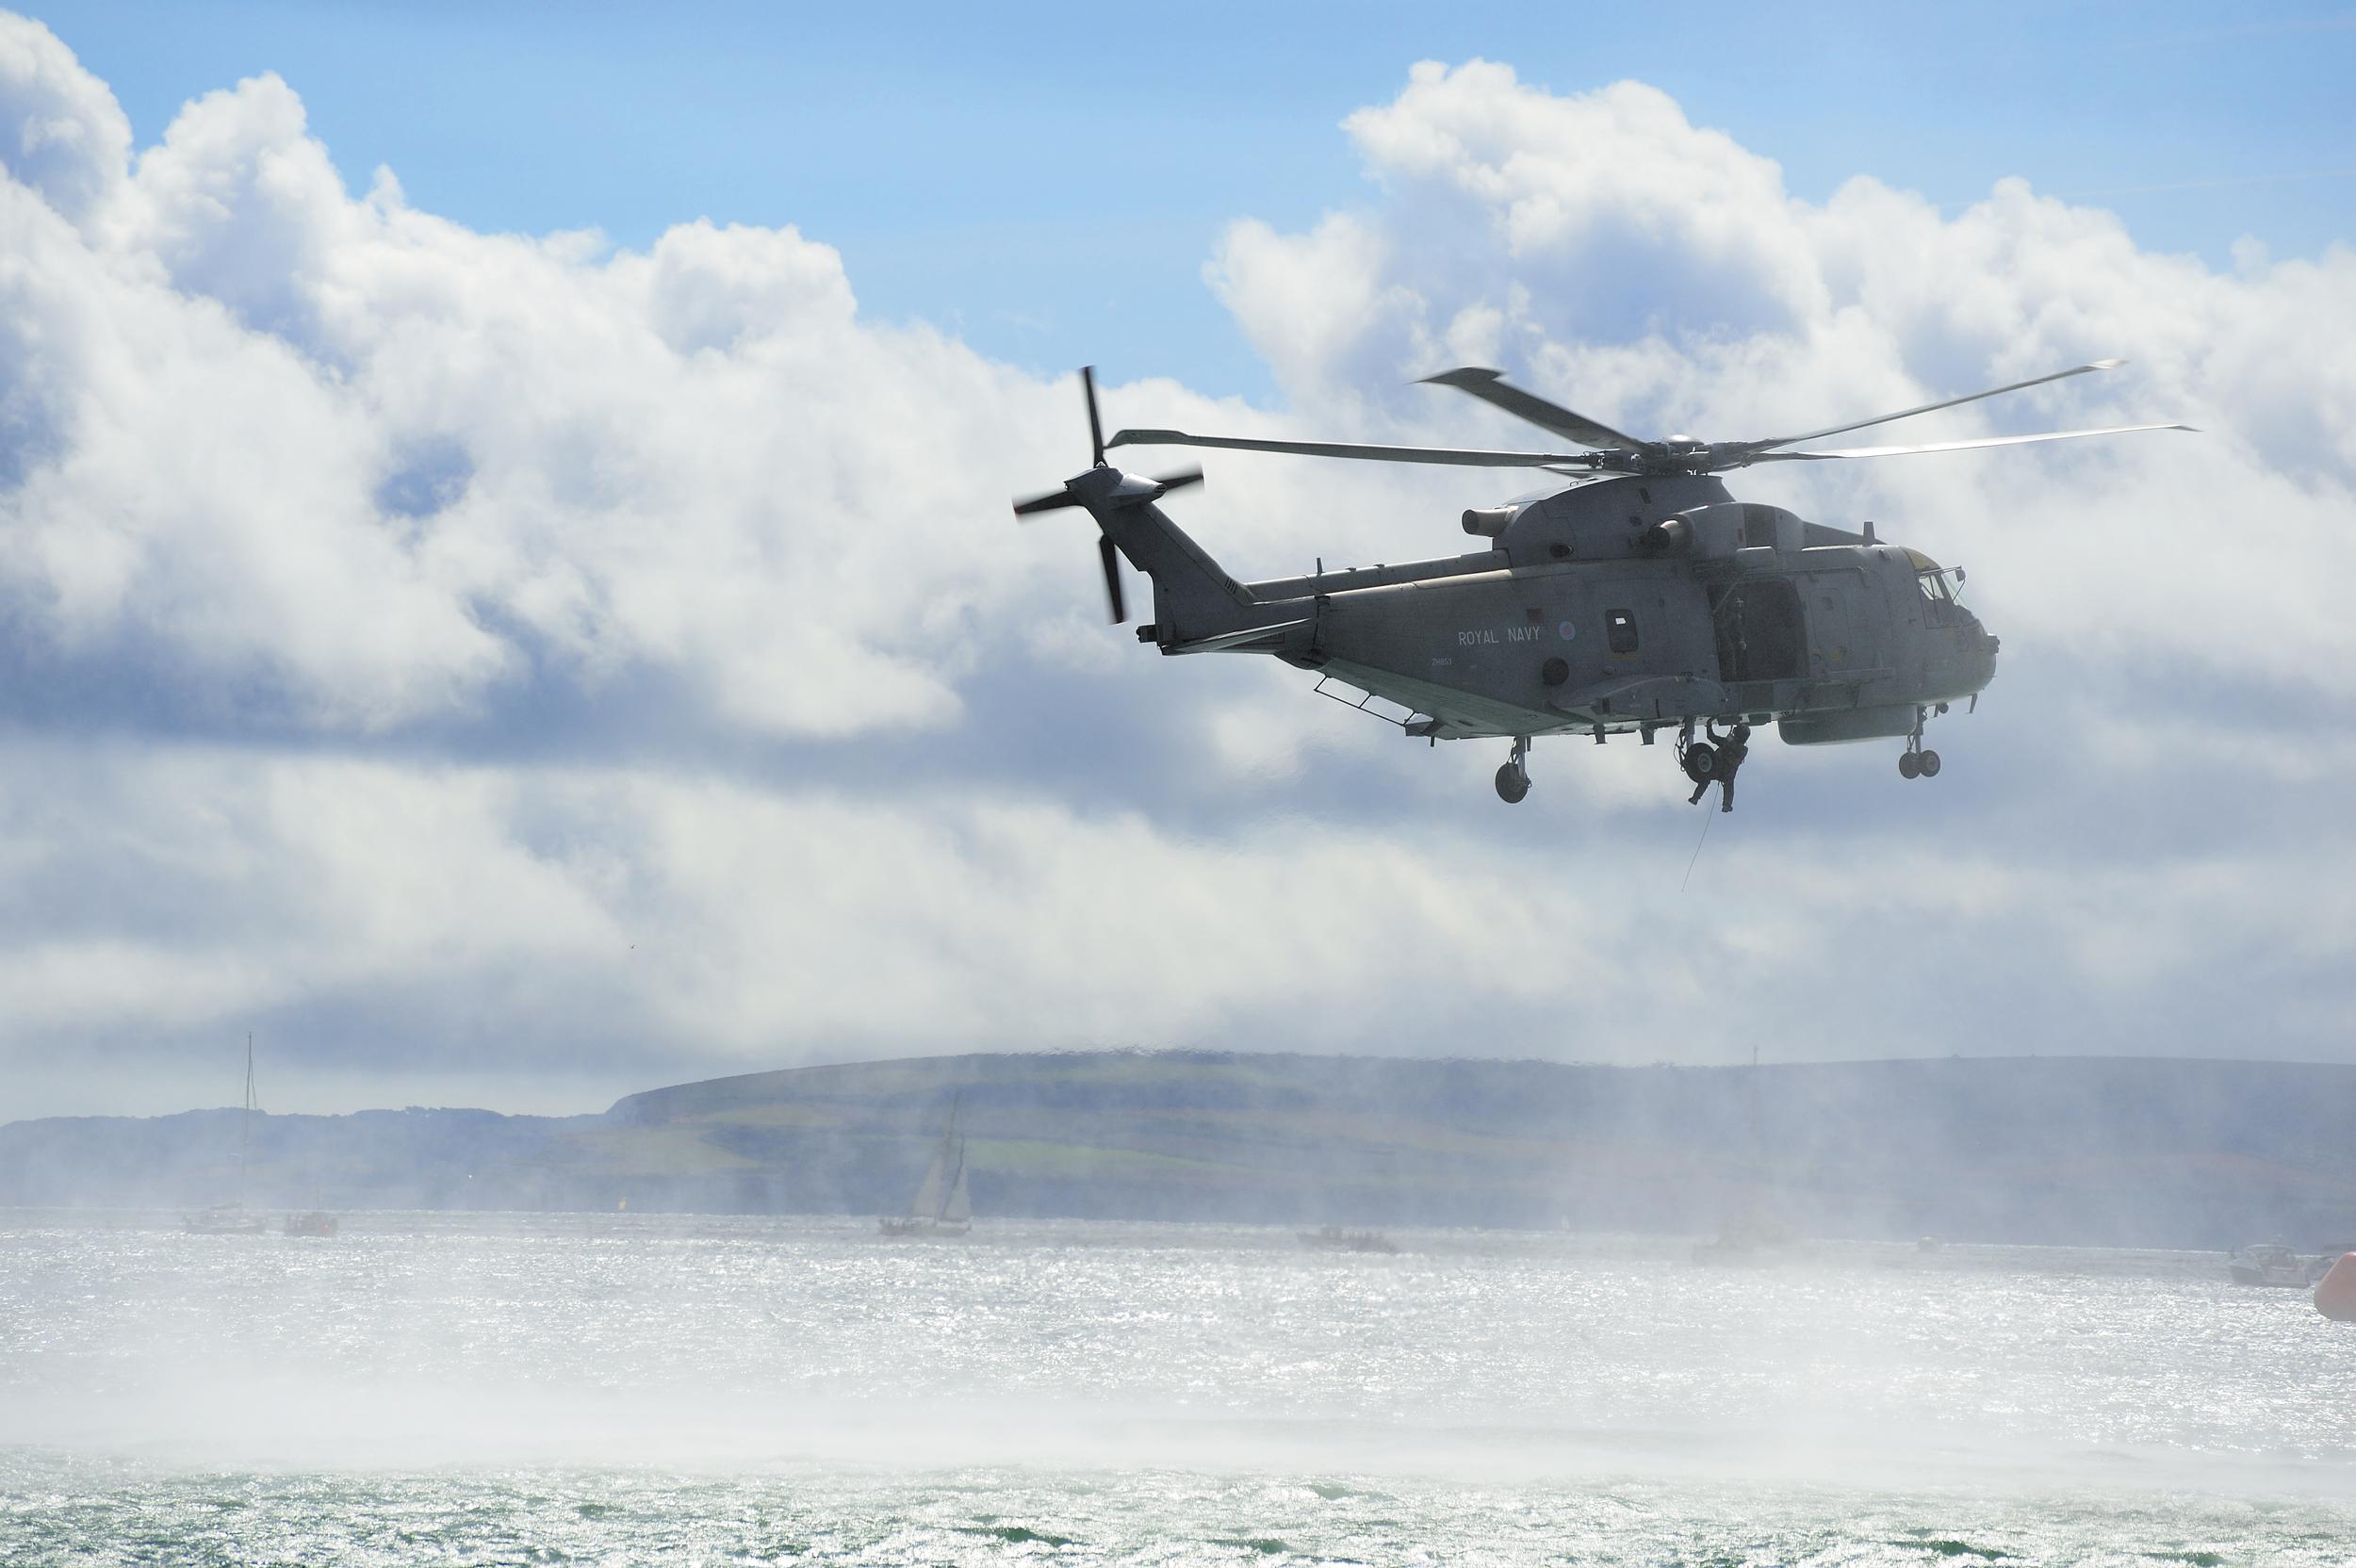 10) Air Show Royal Navy Merlin_CRL0629.jpg